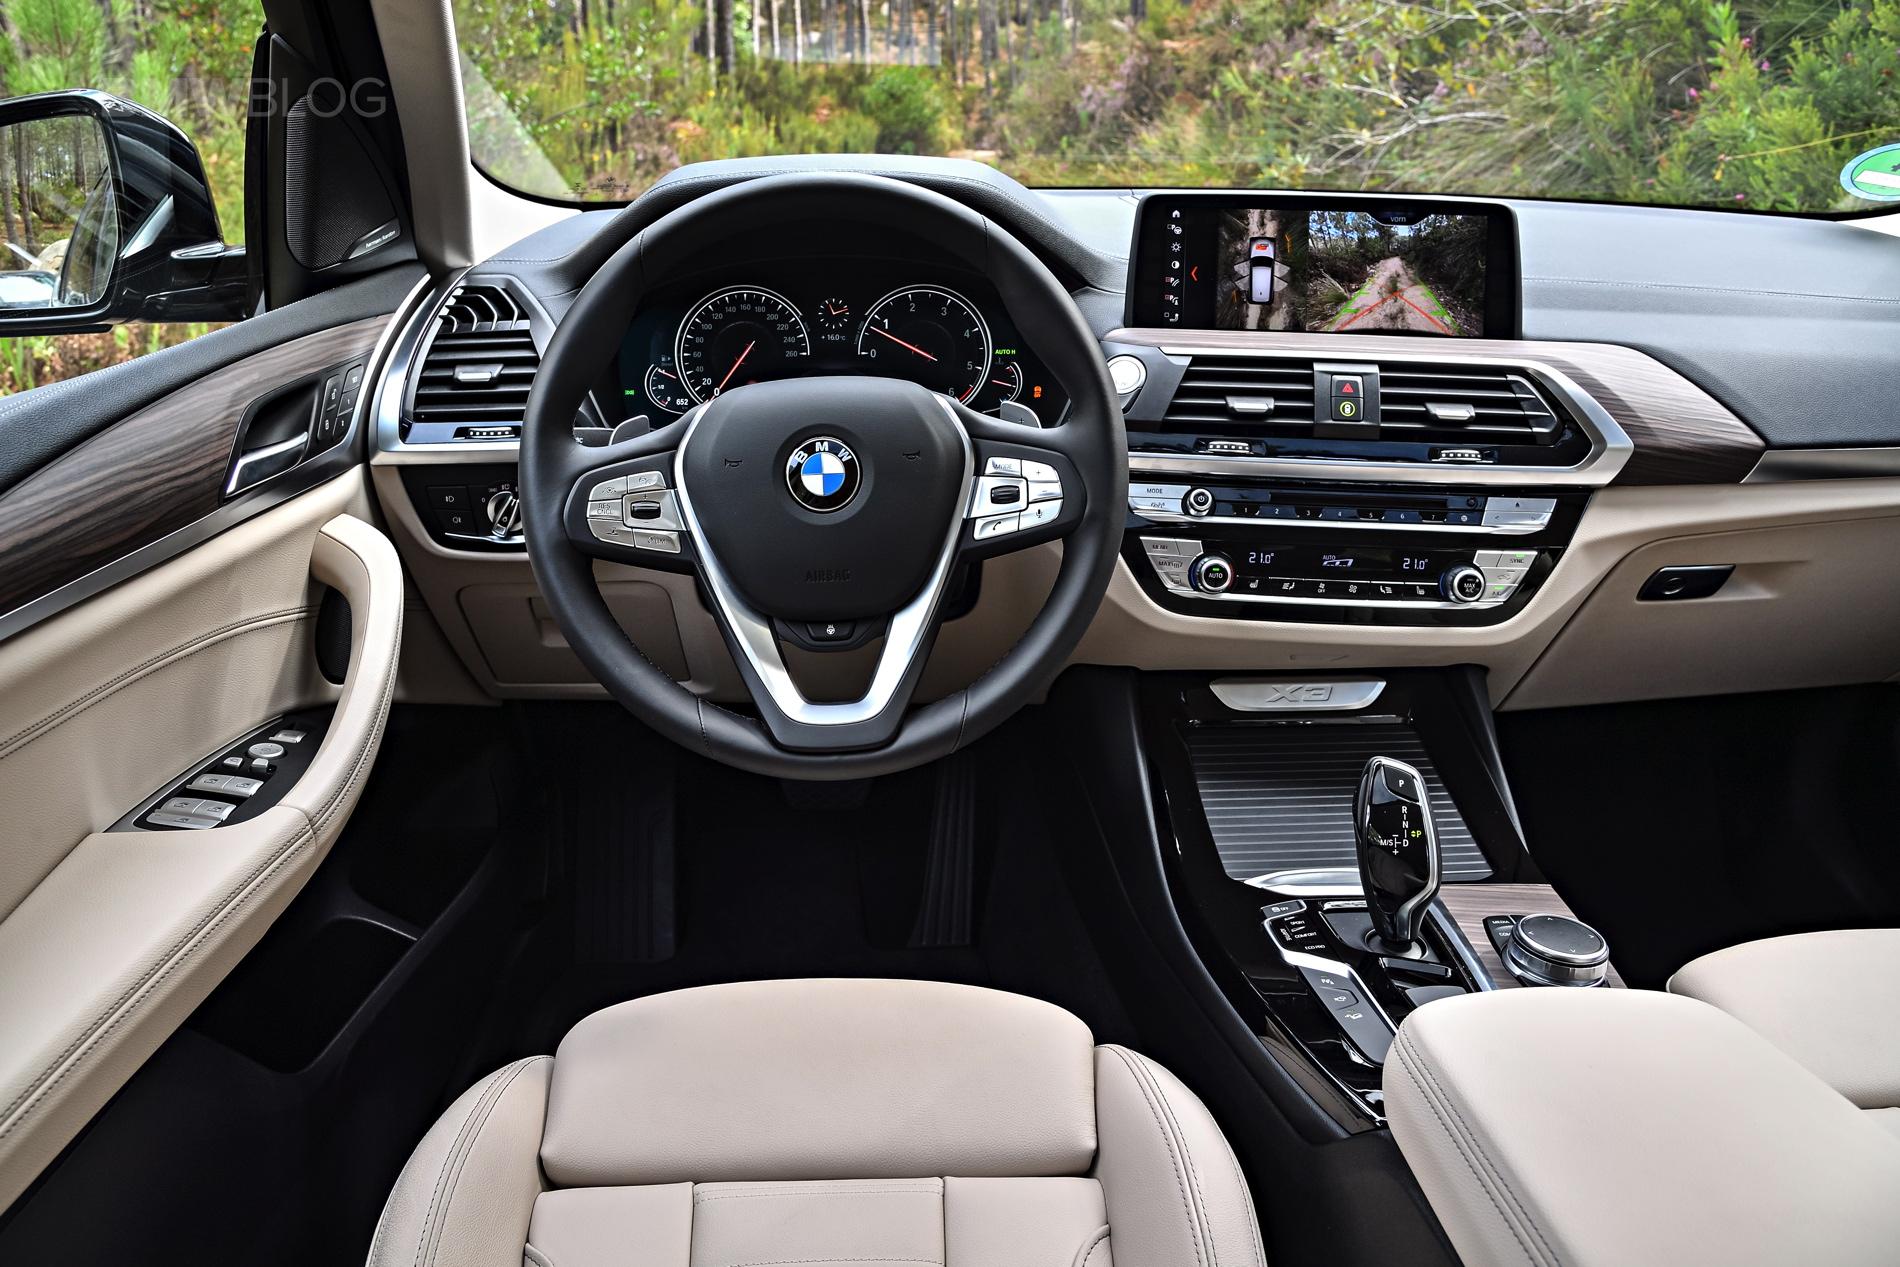 2018 BMW X3 xDrive30D photoshoot 101